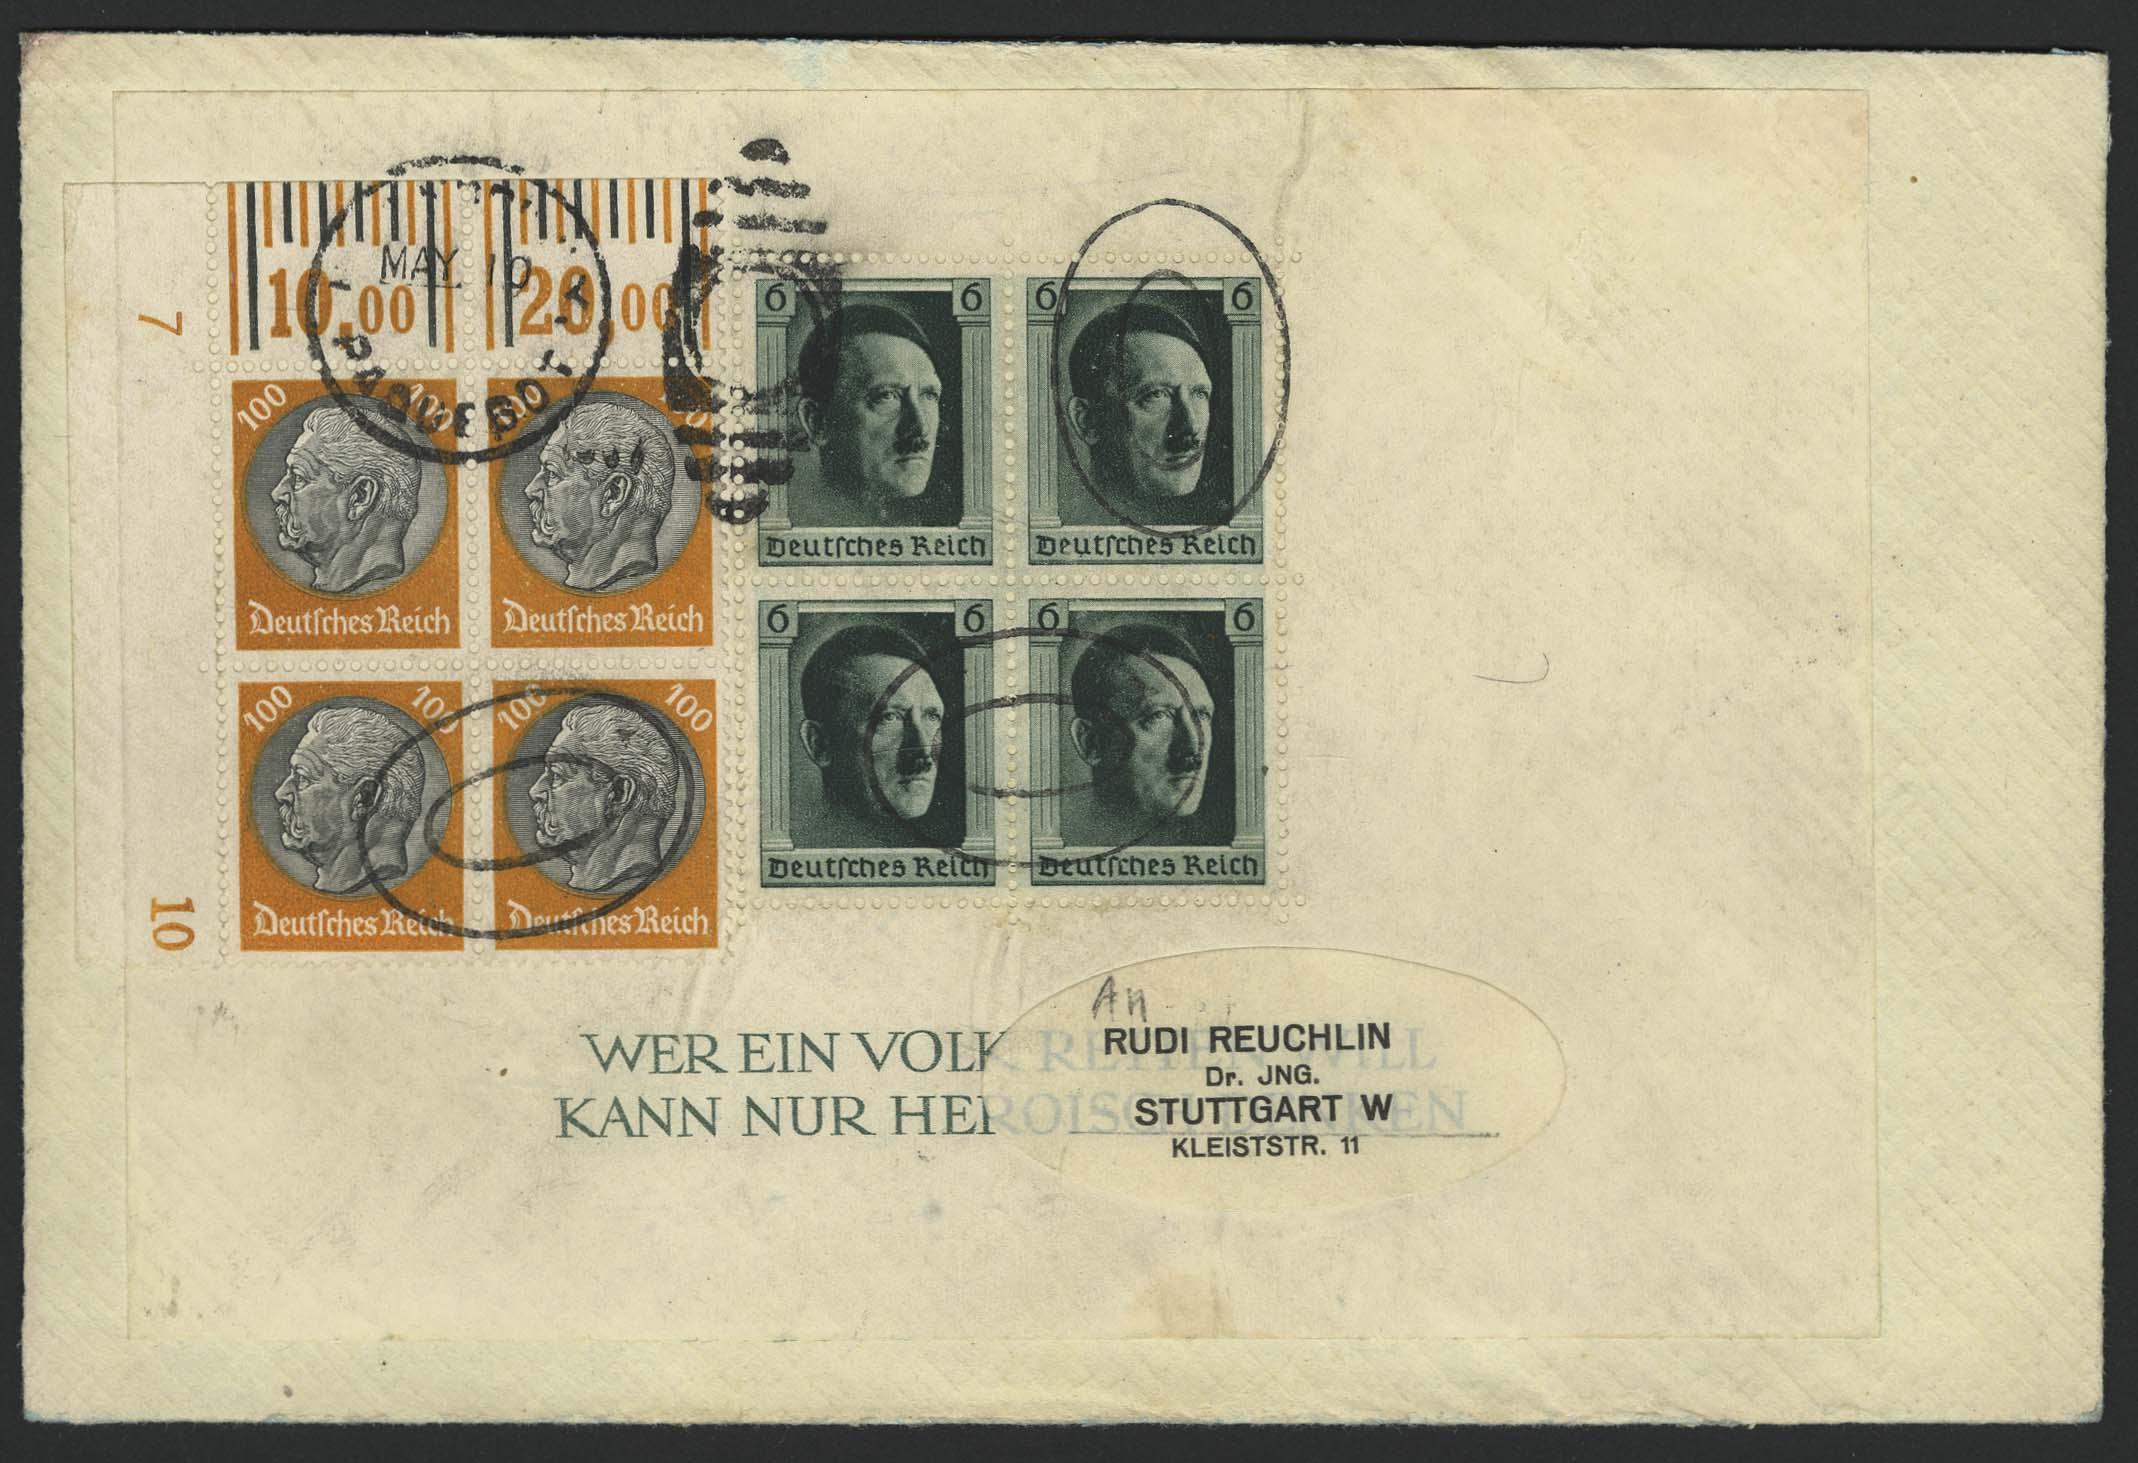 Lot 4428 - zeppelinpost nach sieger LZ 129 - 1937 -  Auktionshaus Ulrich Felzmann GmbH & Co. KG